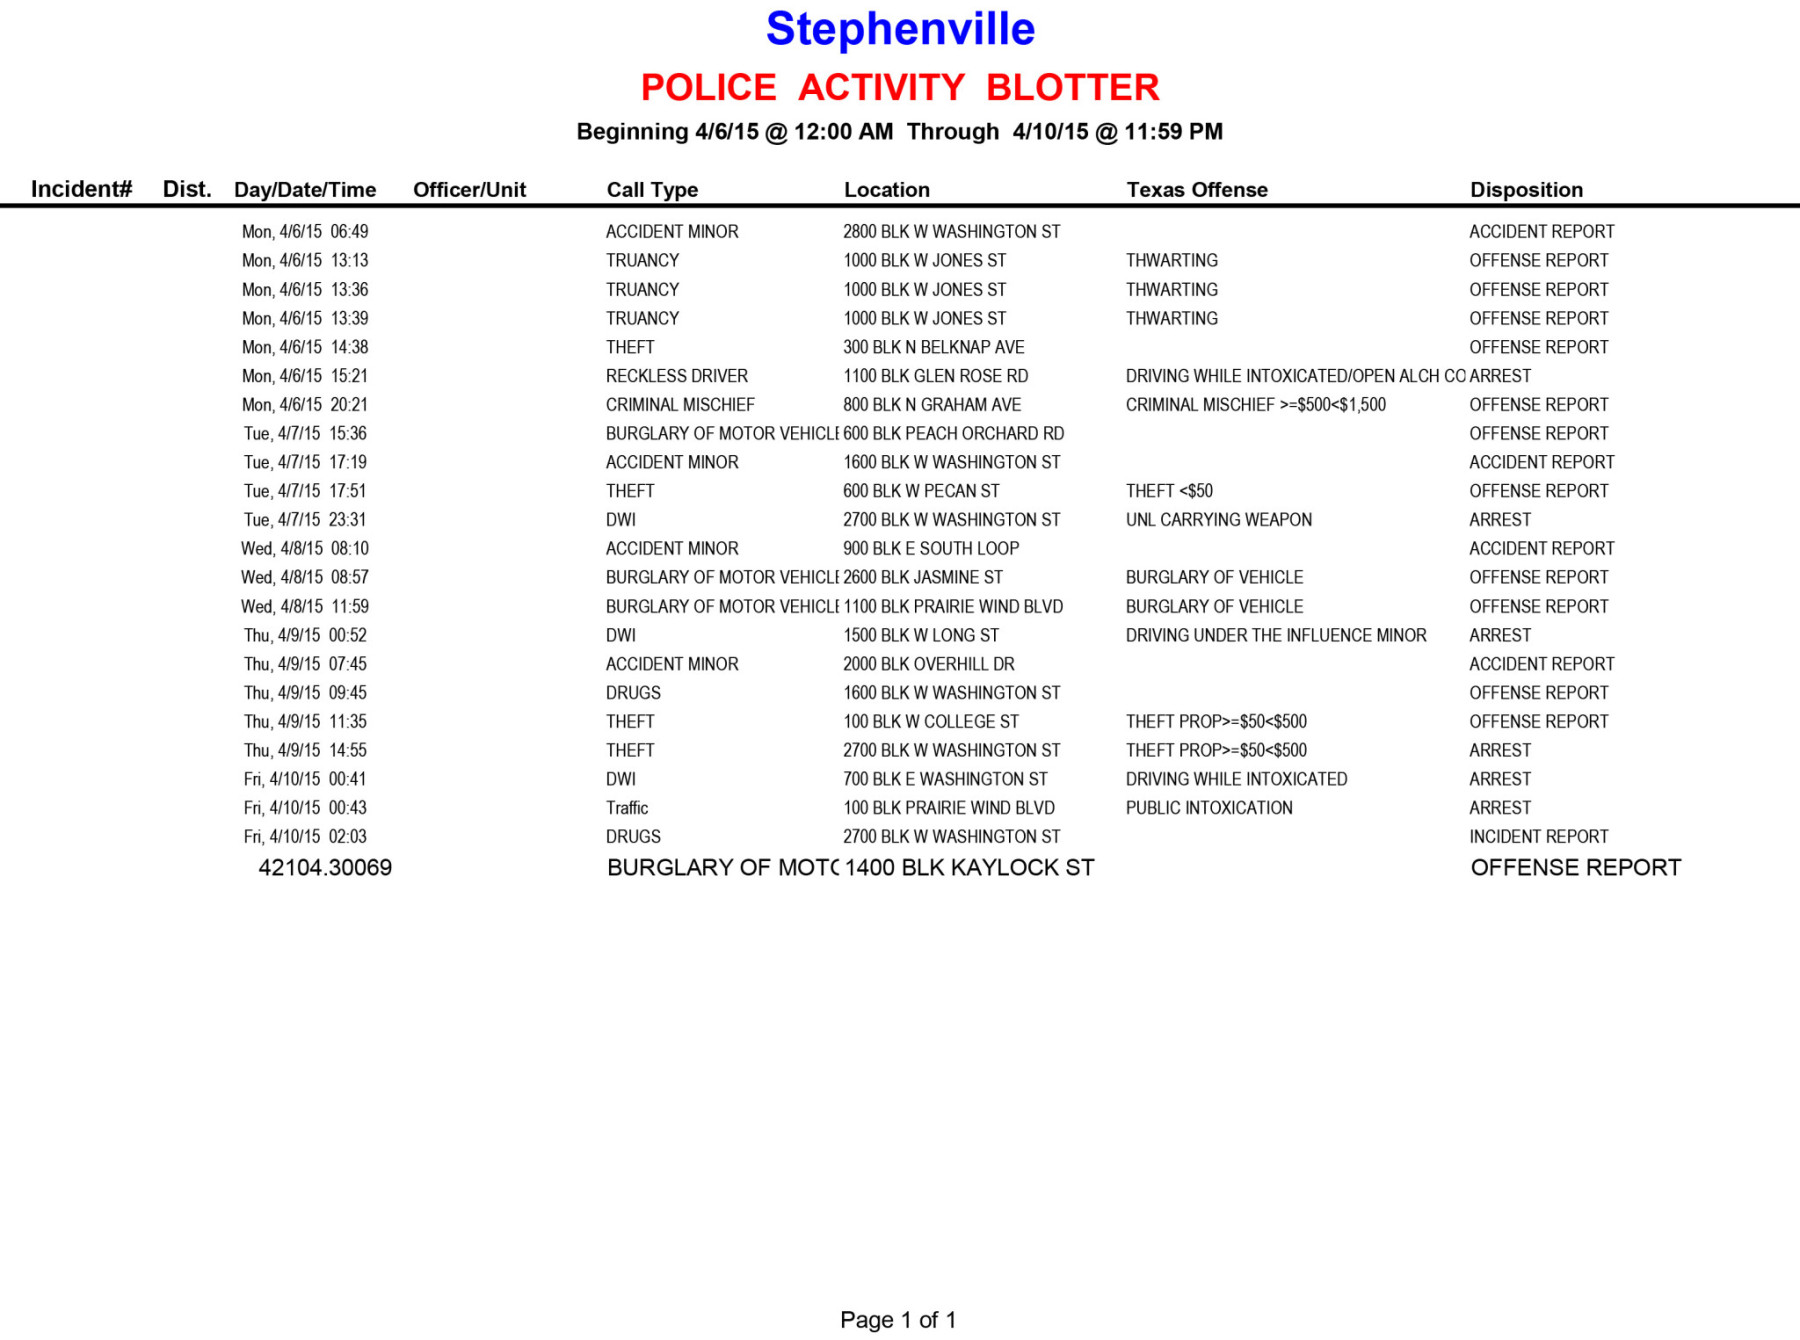 20150406-0410 Police Activity Blotter